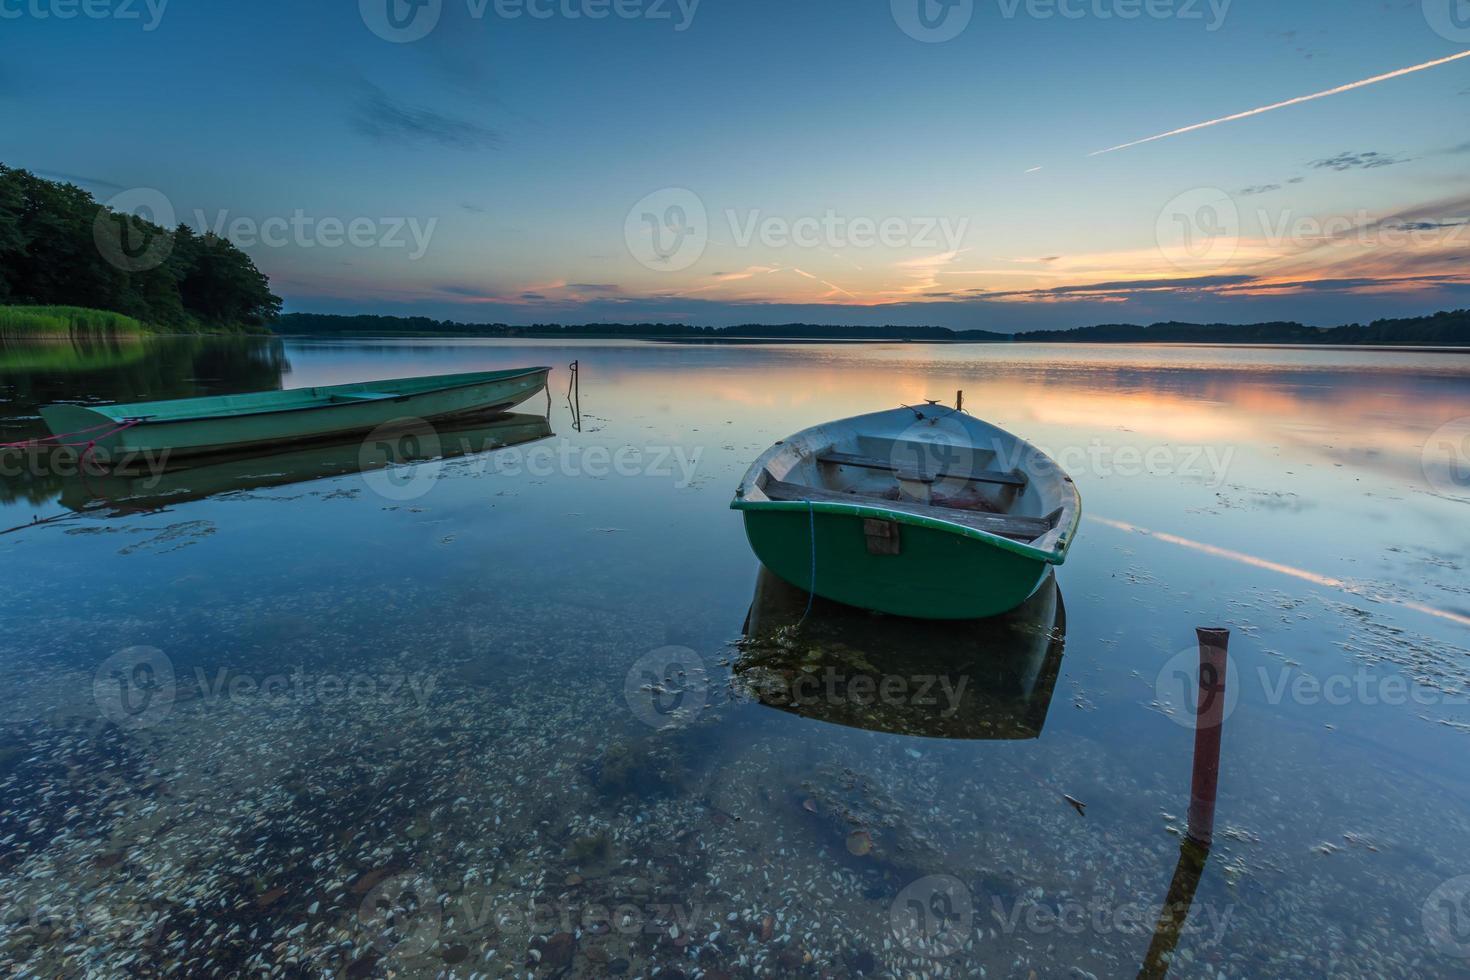 Fisherman boats moored on lake shore under sunset sky photo